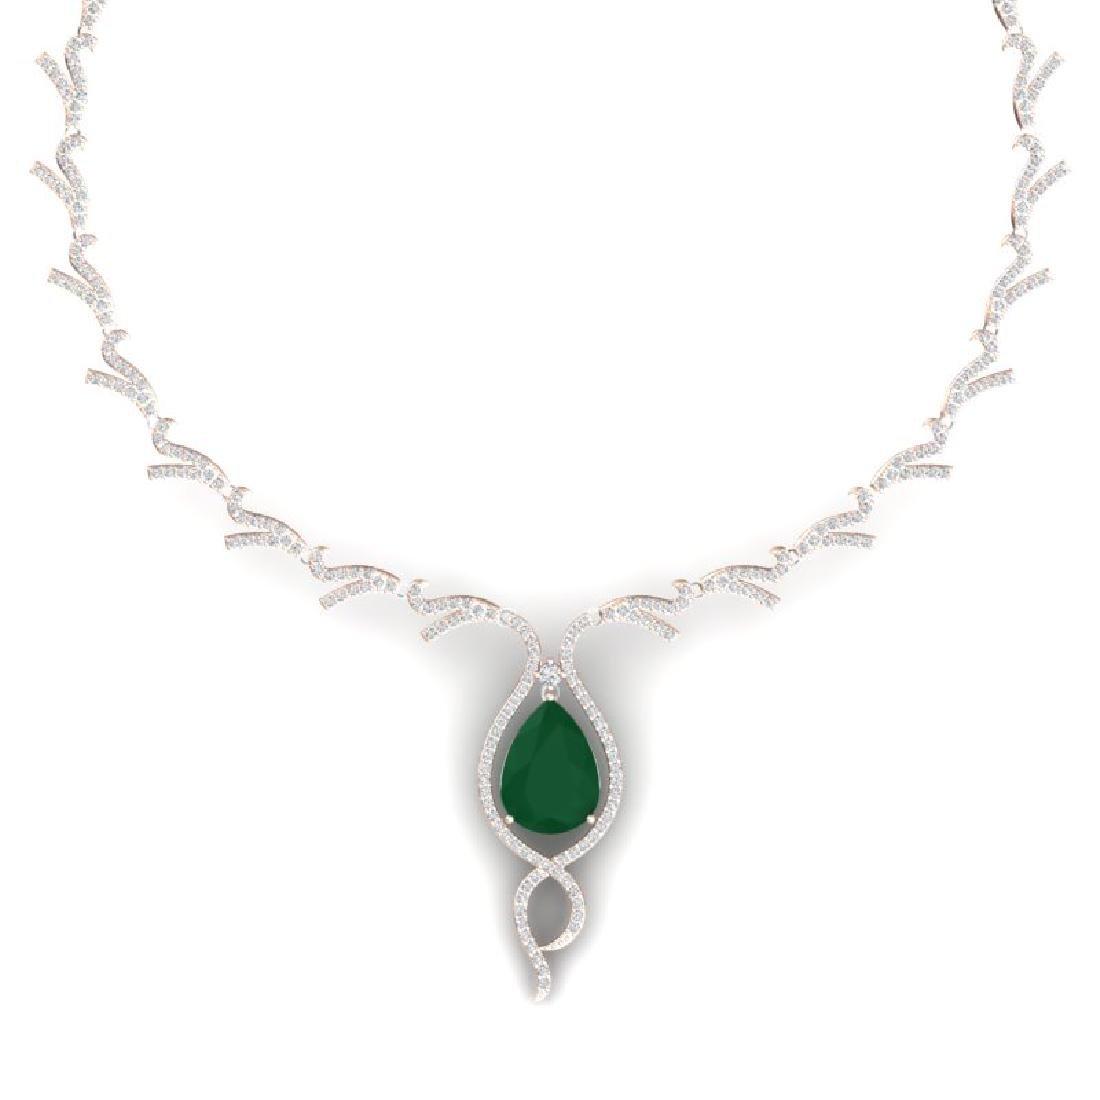 23.43 CTW Royalty Emerald & VS Diamond Necklace 18K